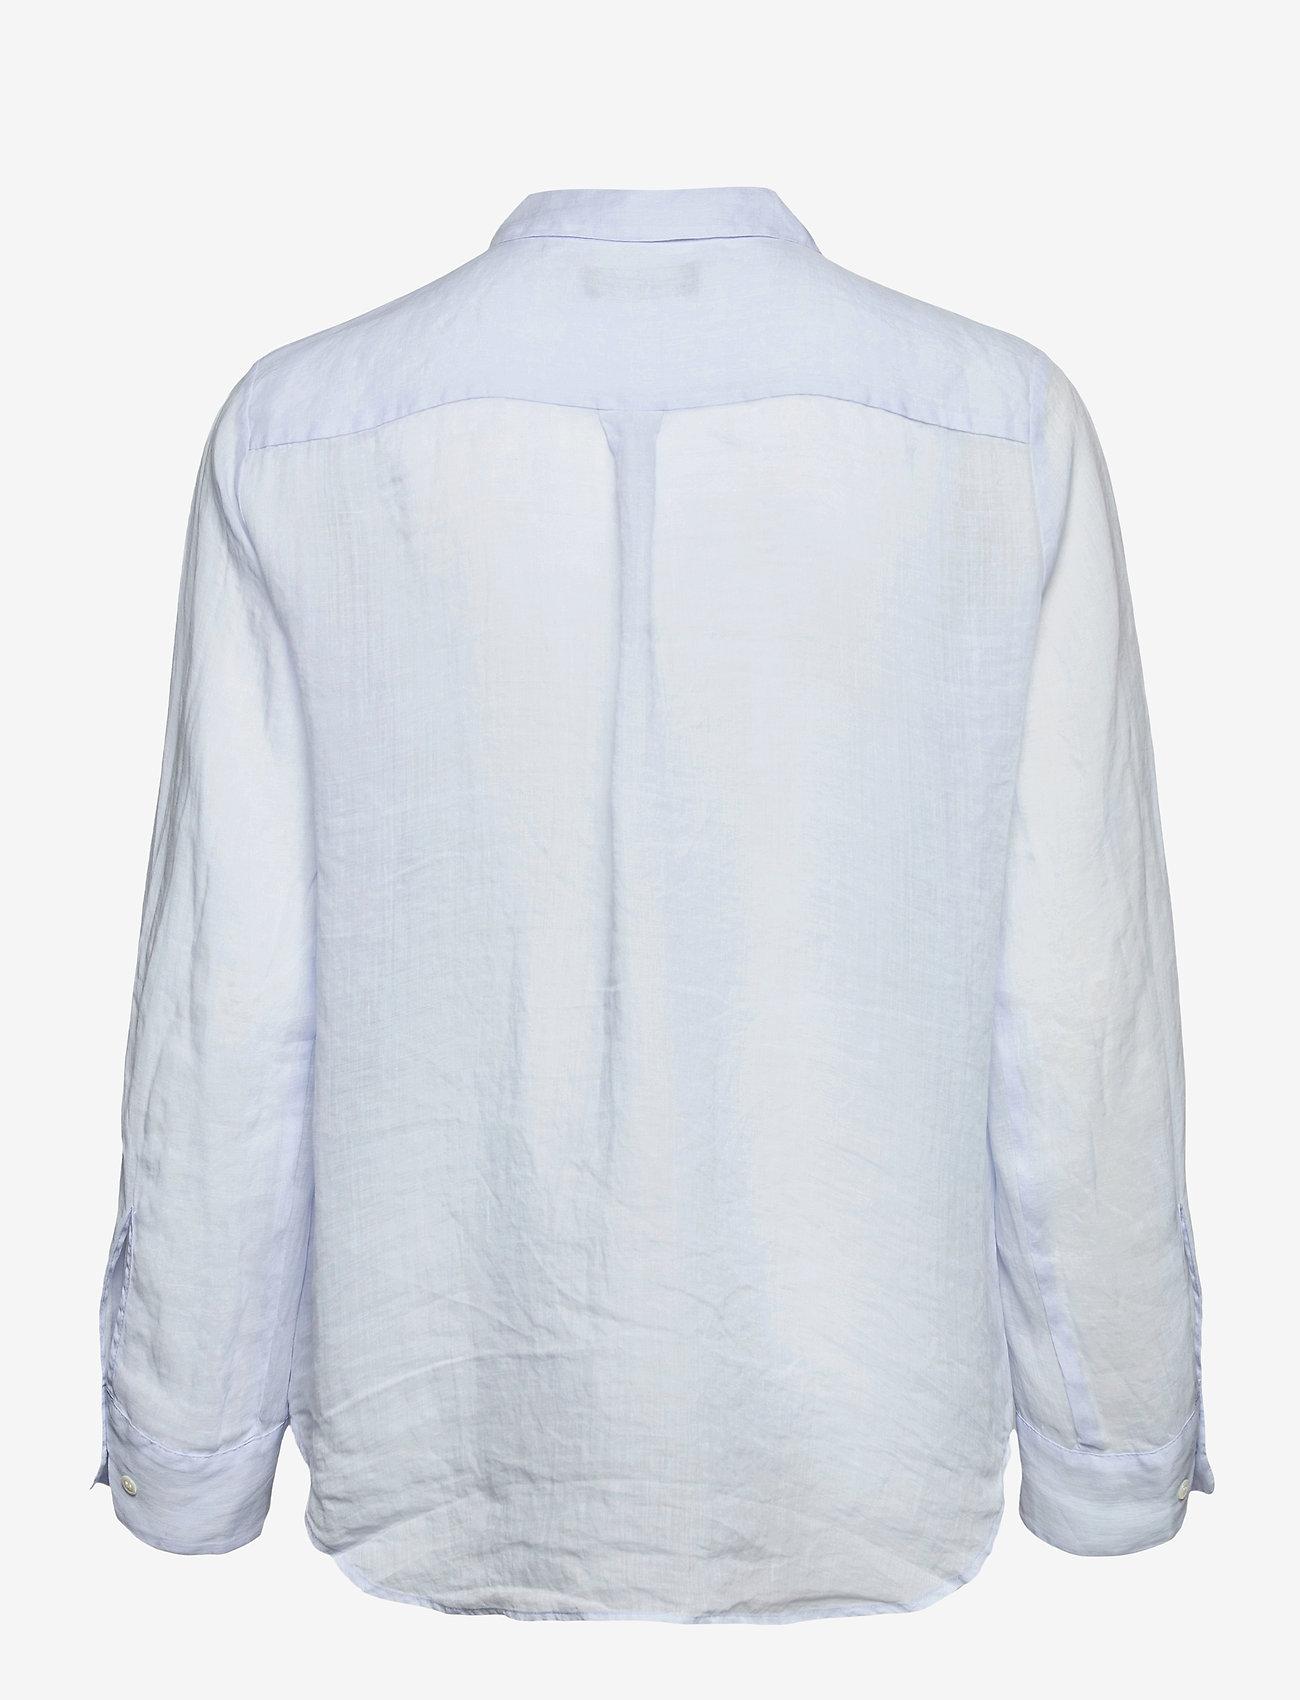 SAND - 8851 - Nami - overhemden met lange mouwen - ice blue - 1